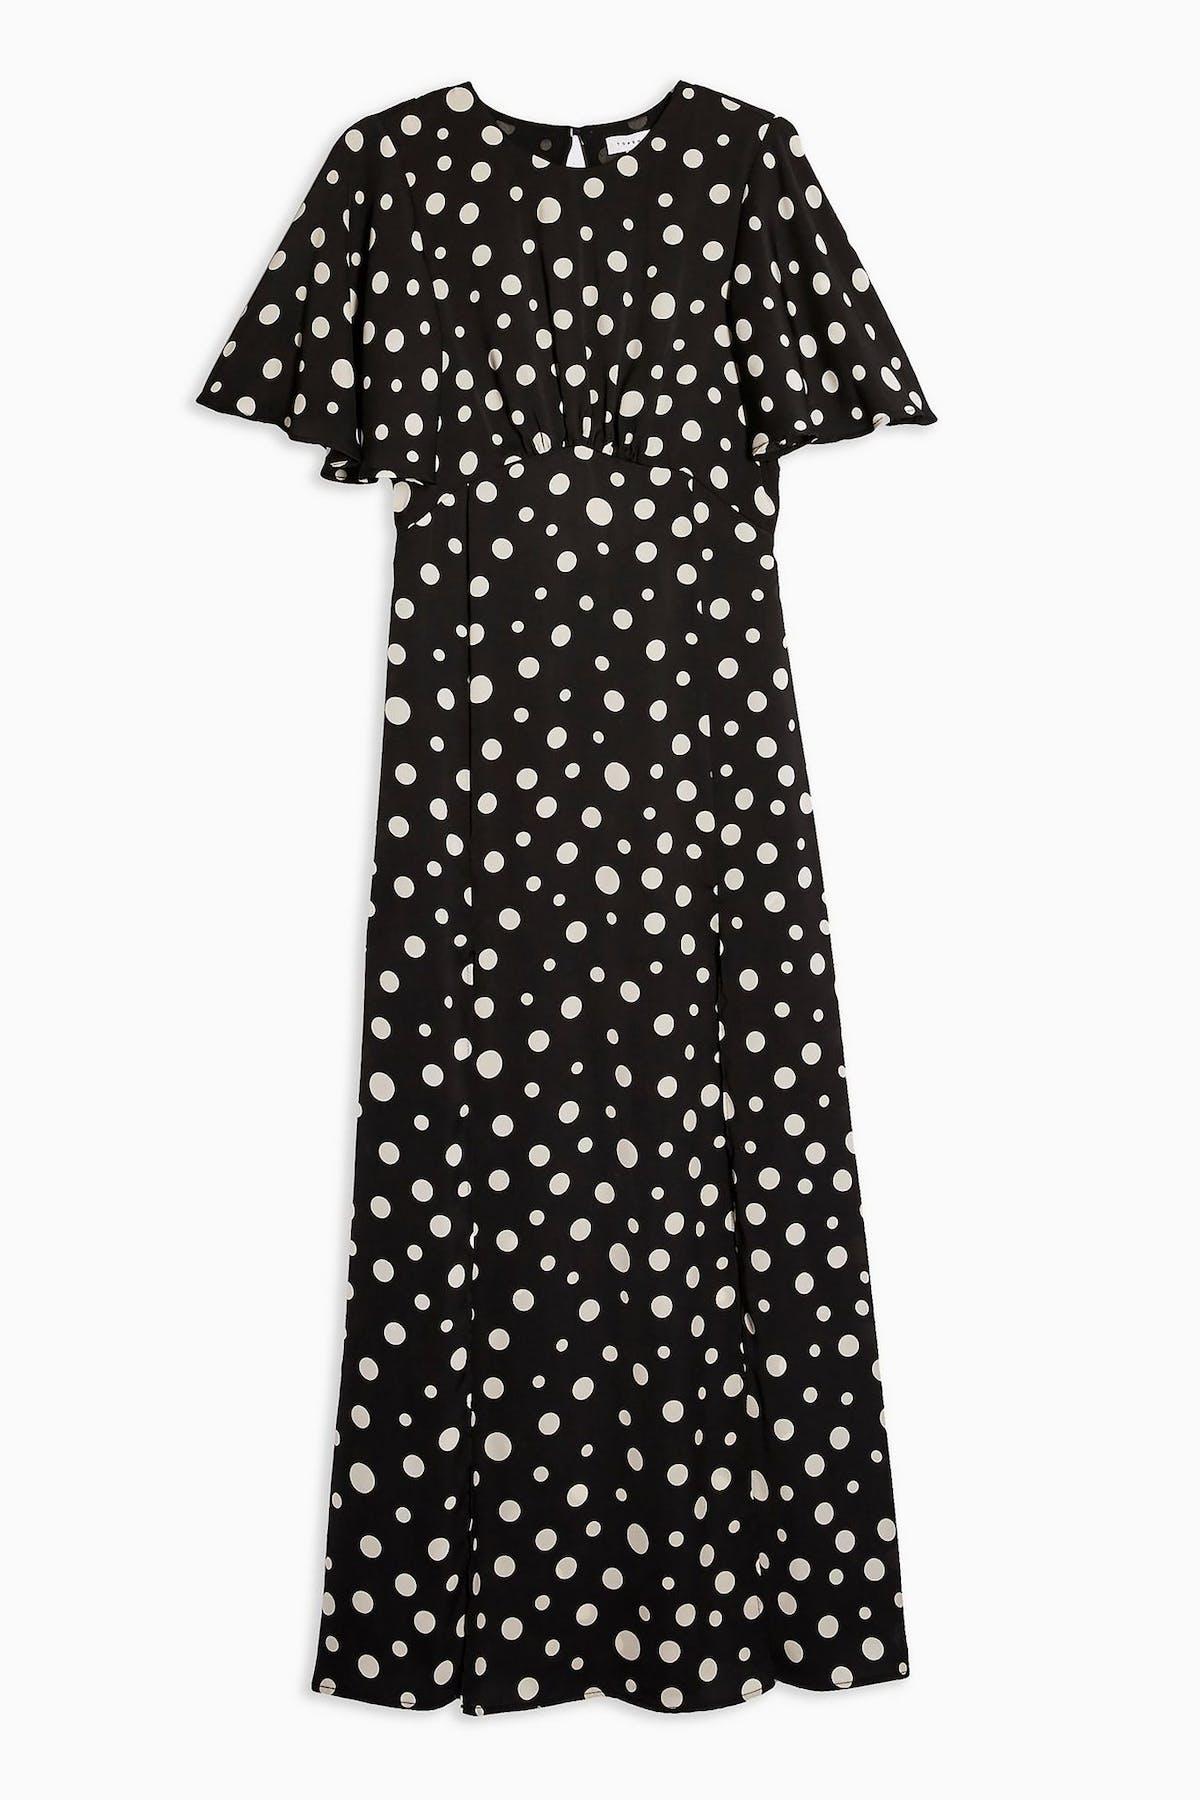 Topshop Dress Buy Austin Dress Online Now